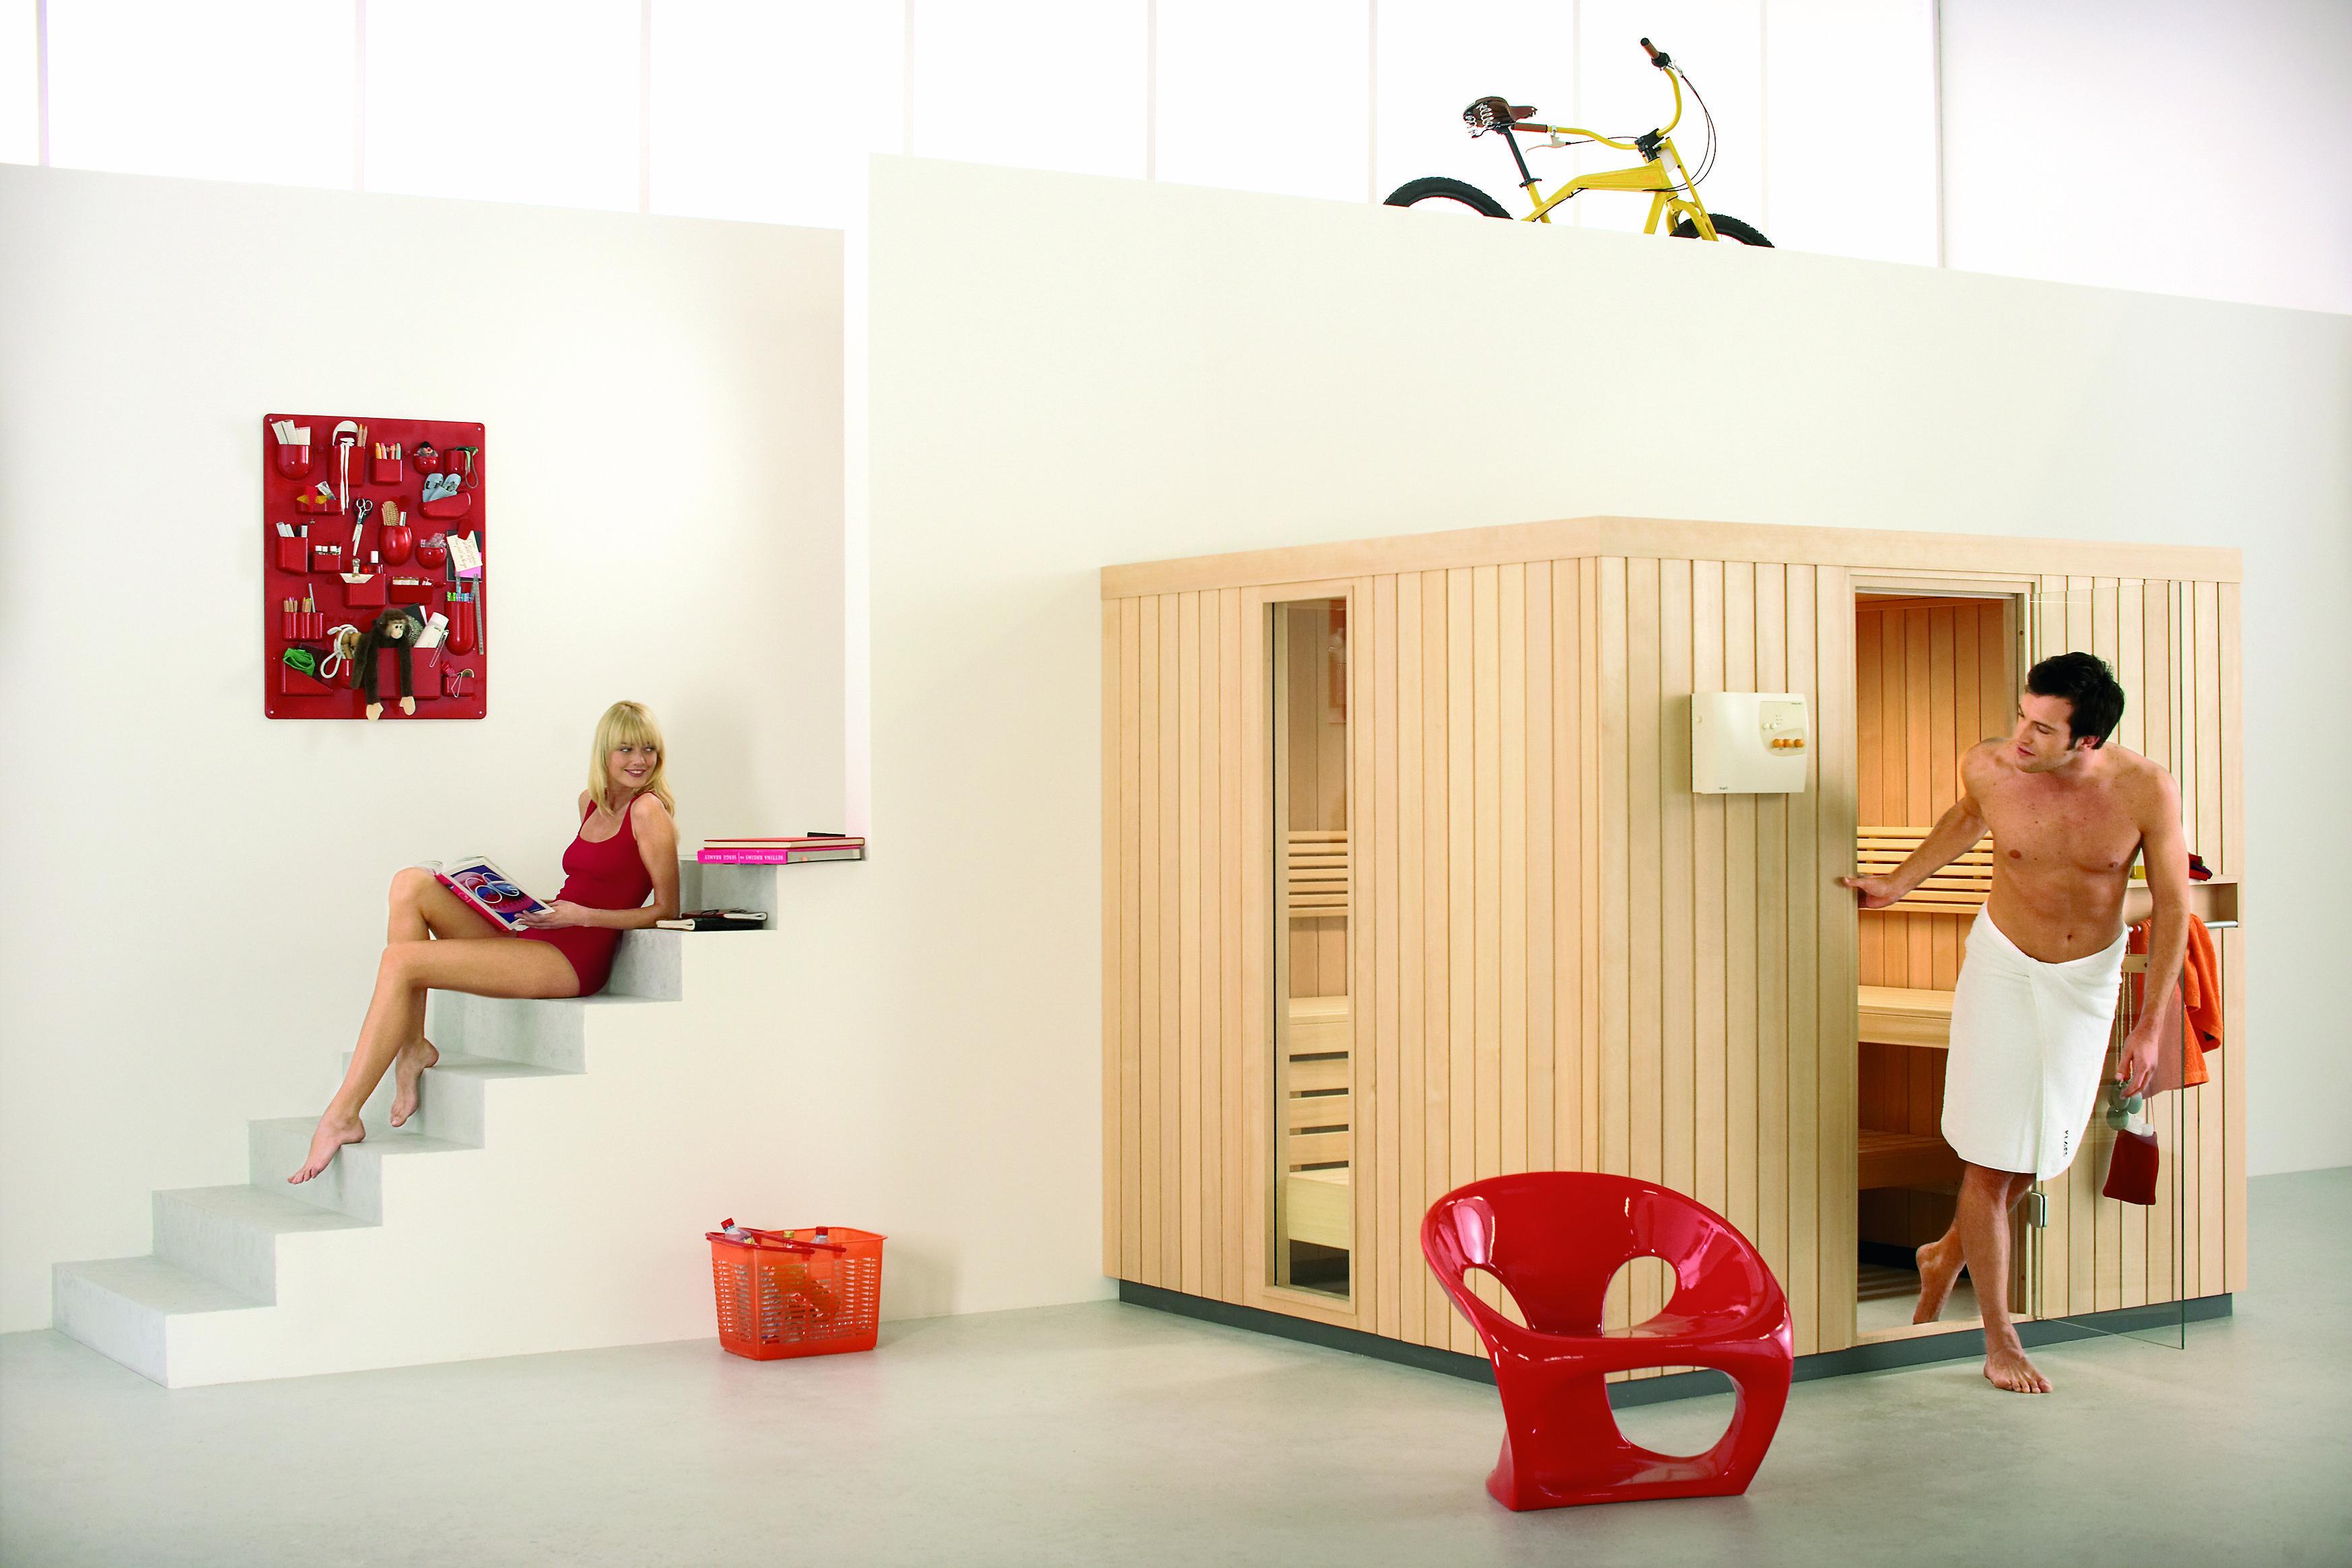 Klafs home sauna | Home Sauna | Pinterest | Saunas